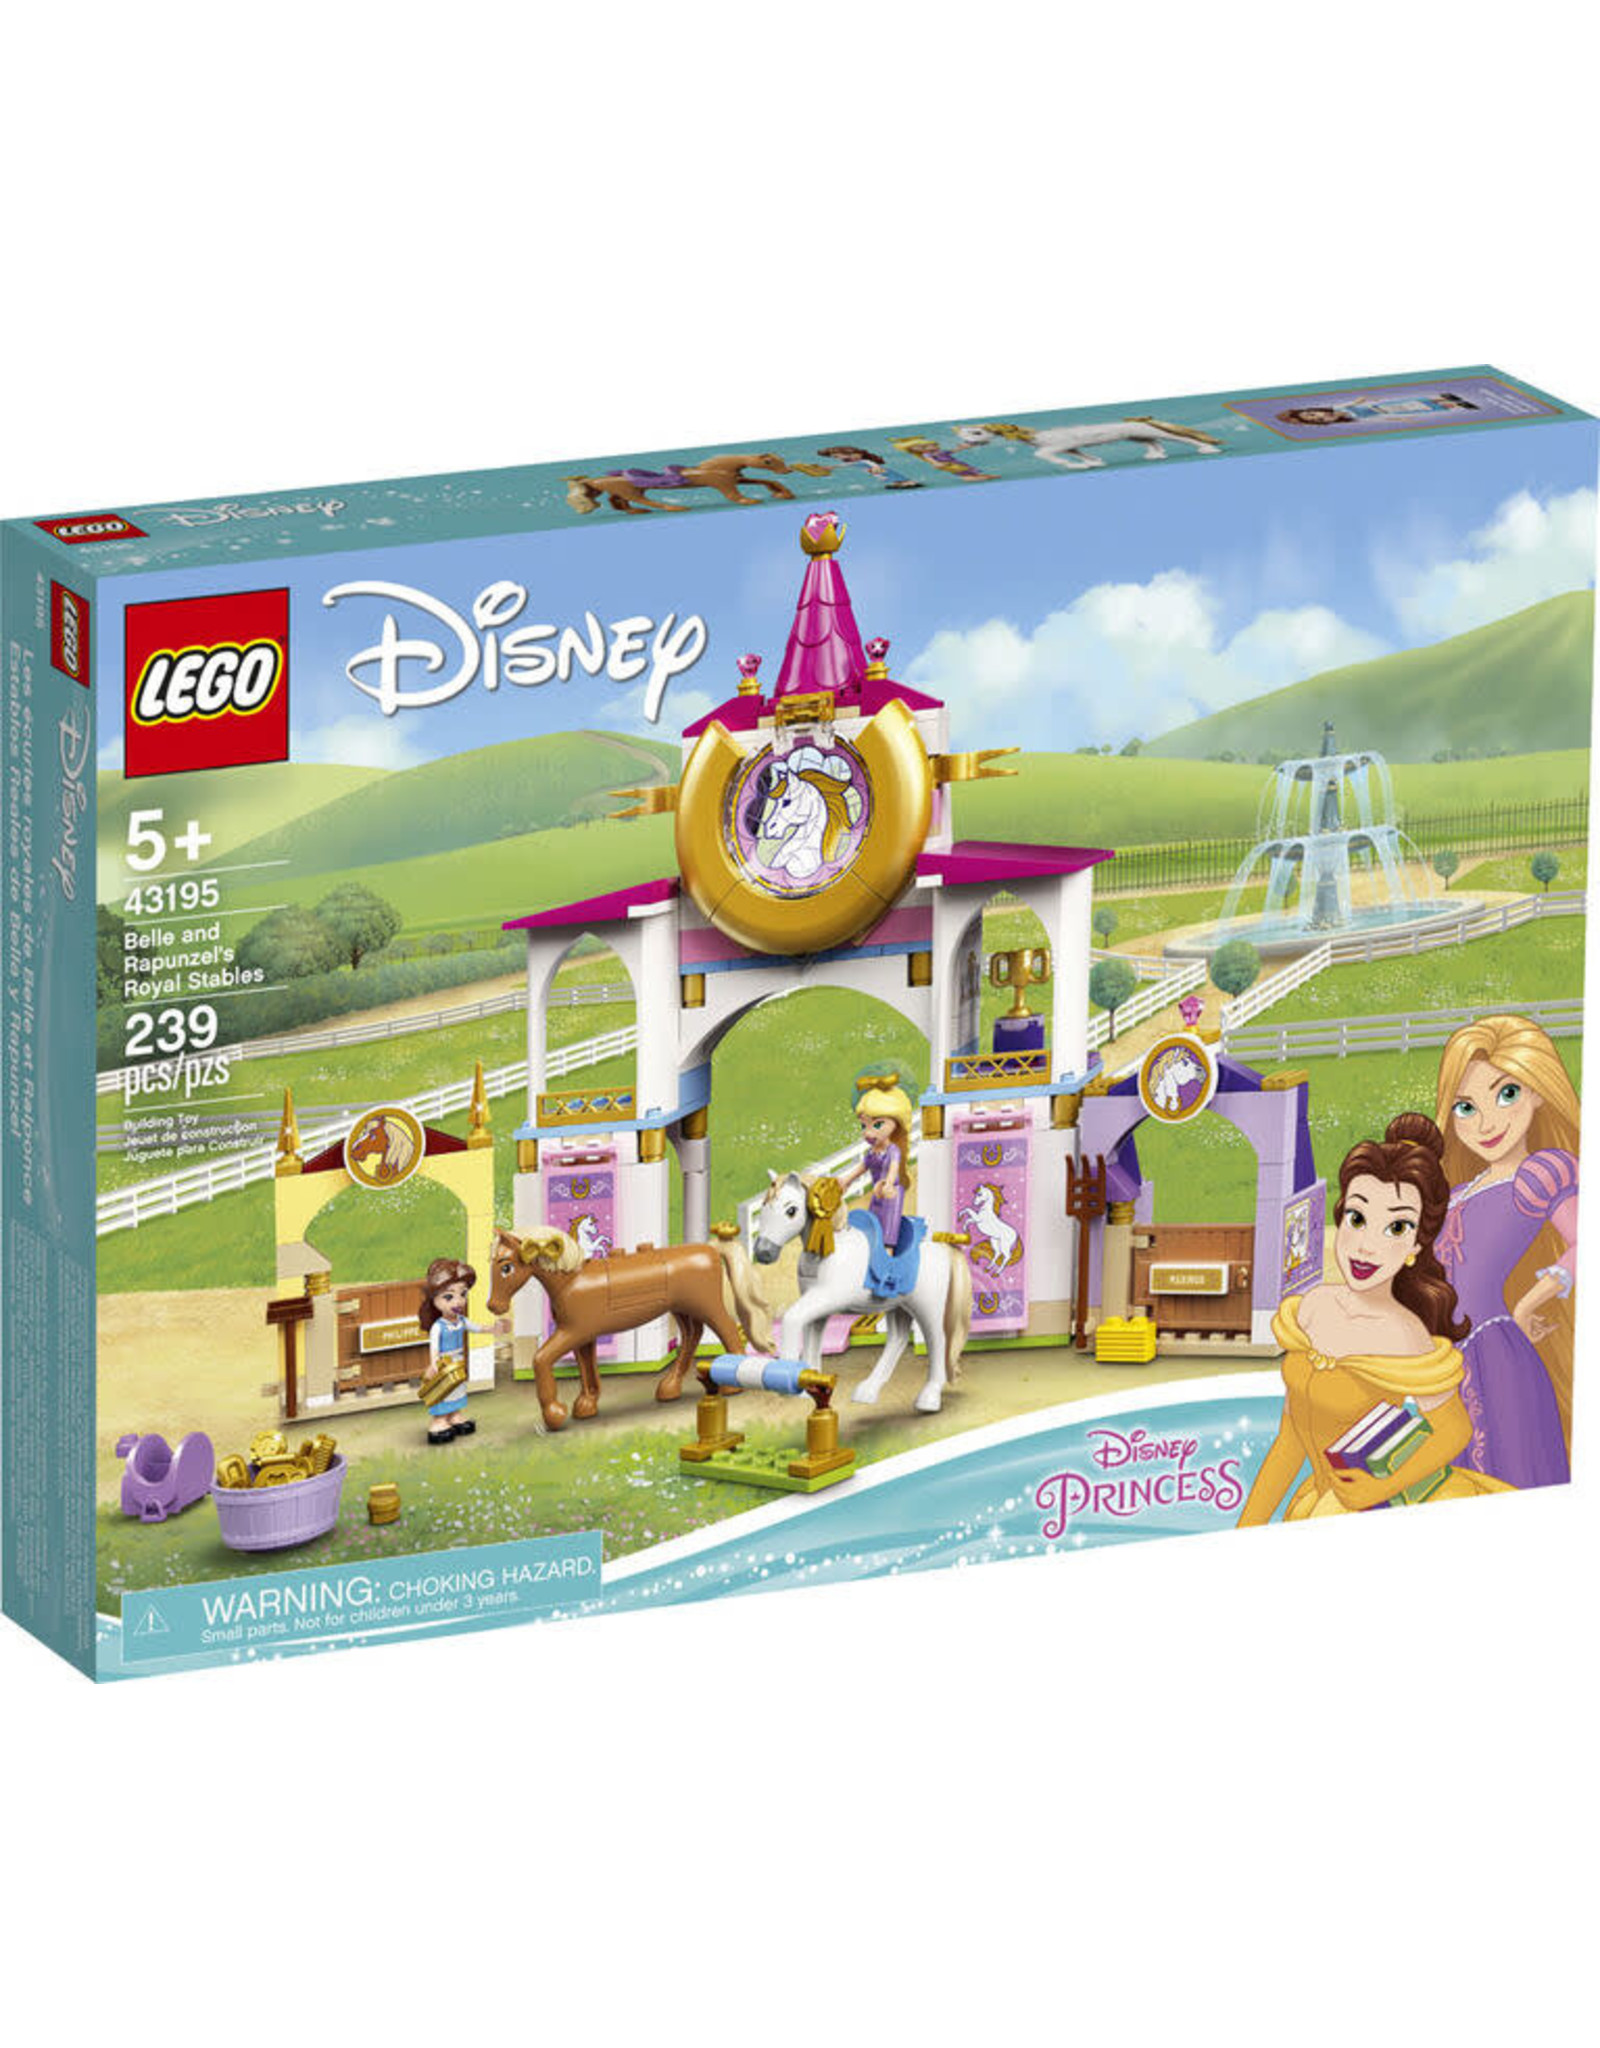 Lego Belle and Rapunzel's Royal Stables